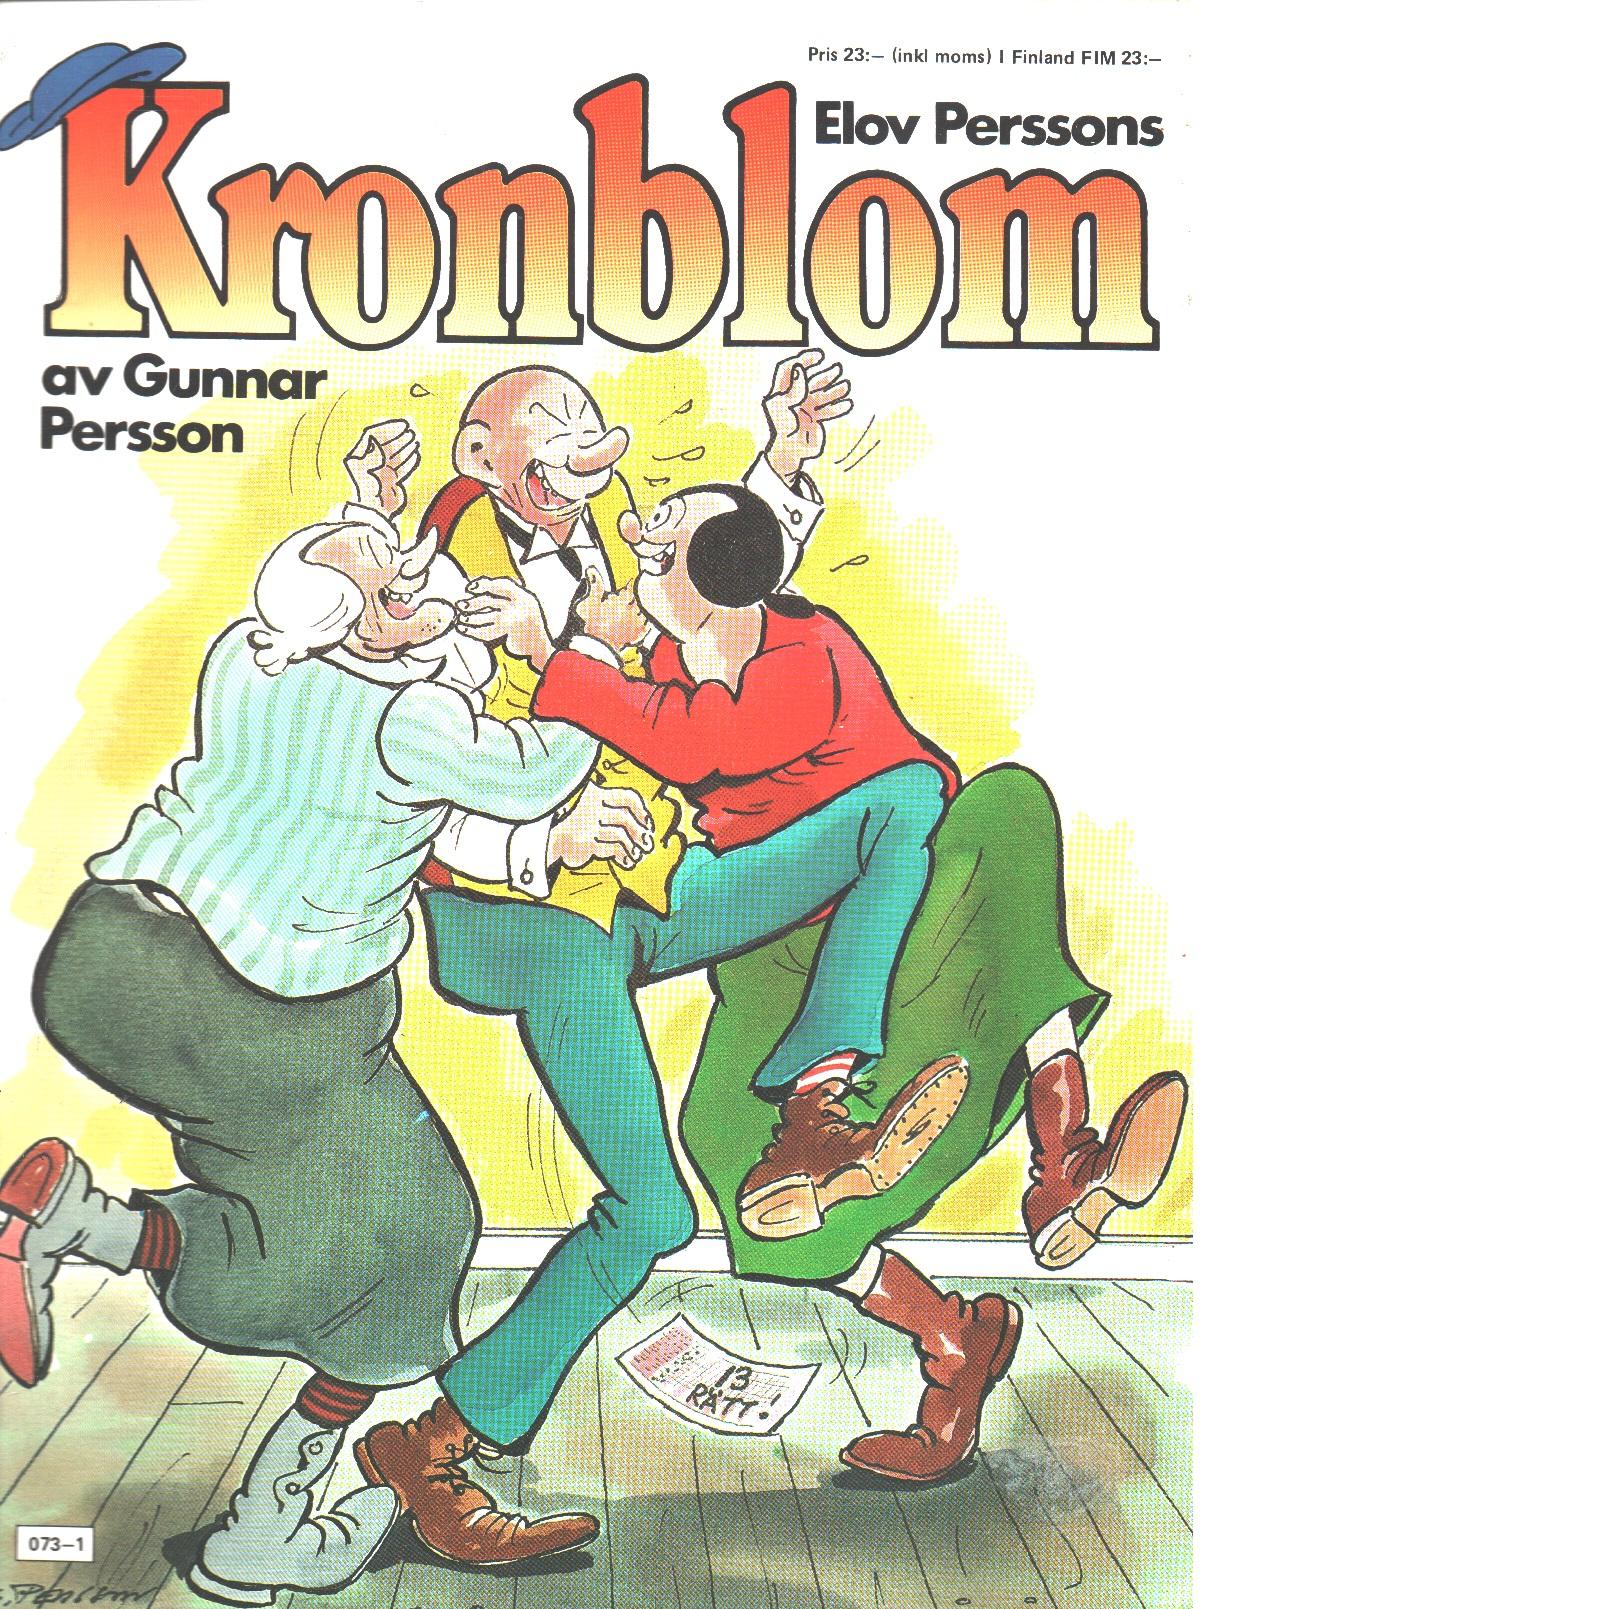 Elov Perssons Kronblom. - Persson, Gunnar